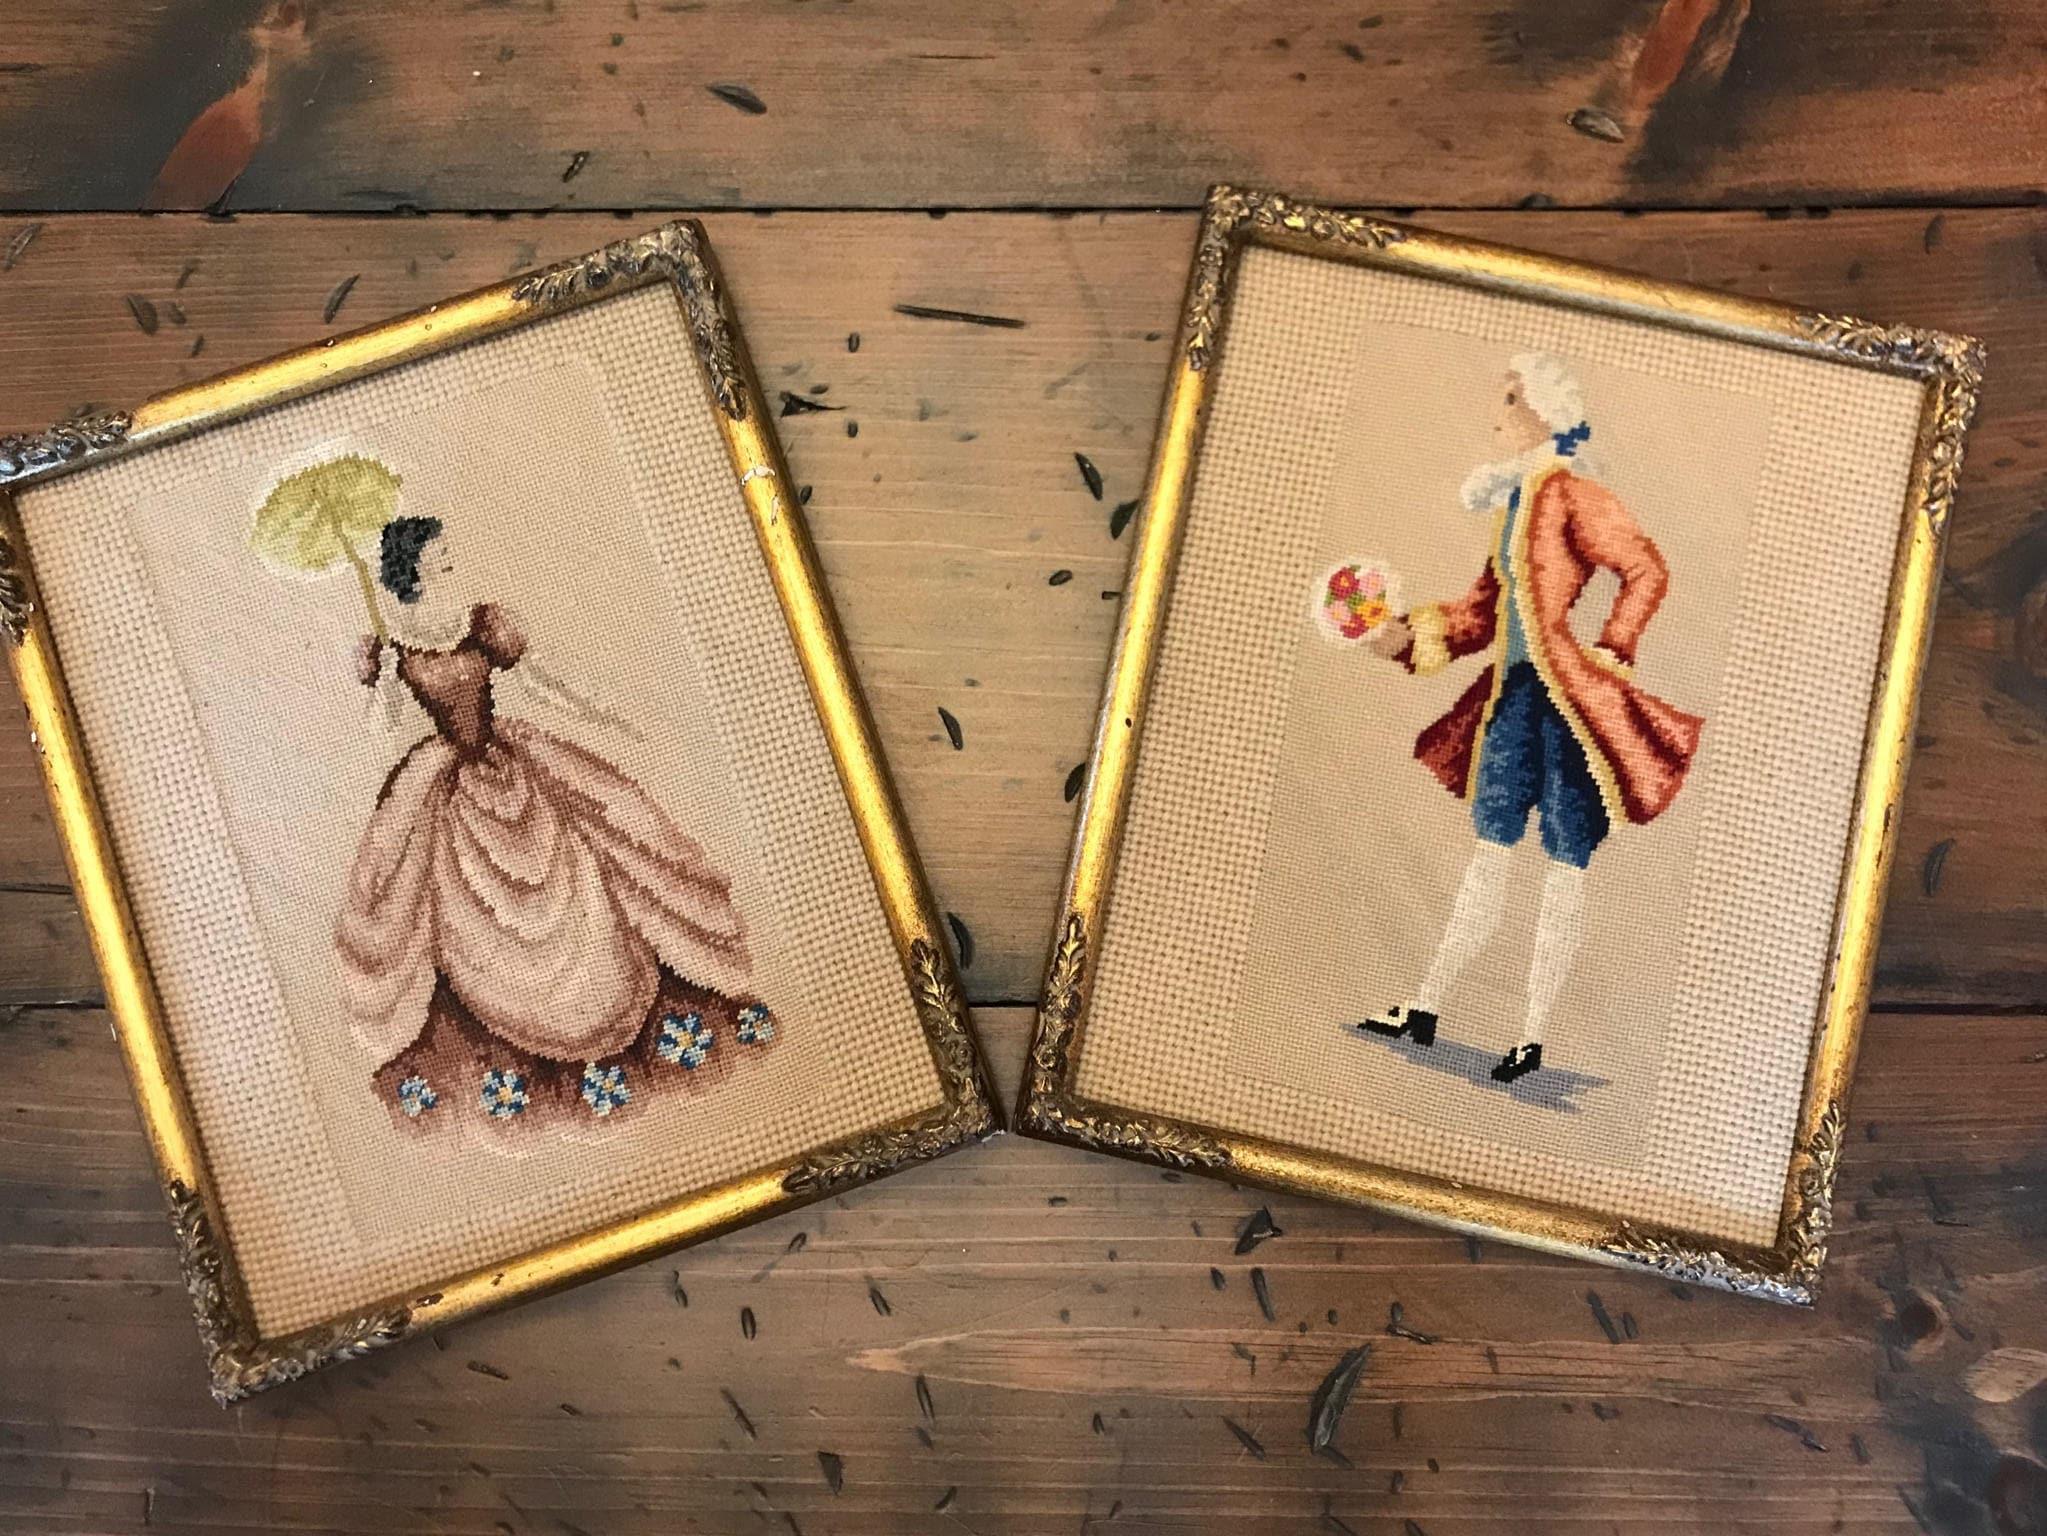 Vintage Needlepoint, 18th Century Couple, Cross Stitch, Tapestry ...